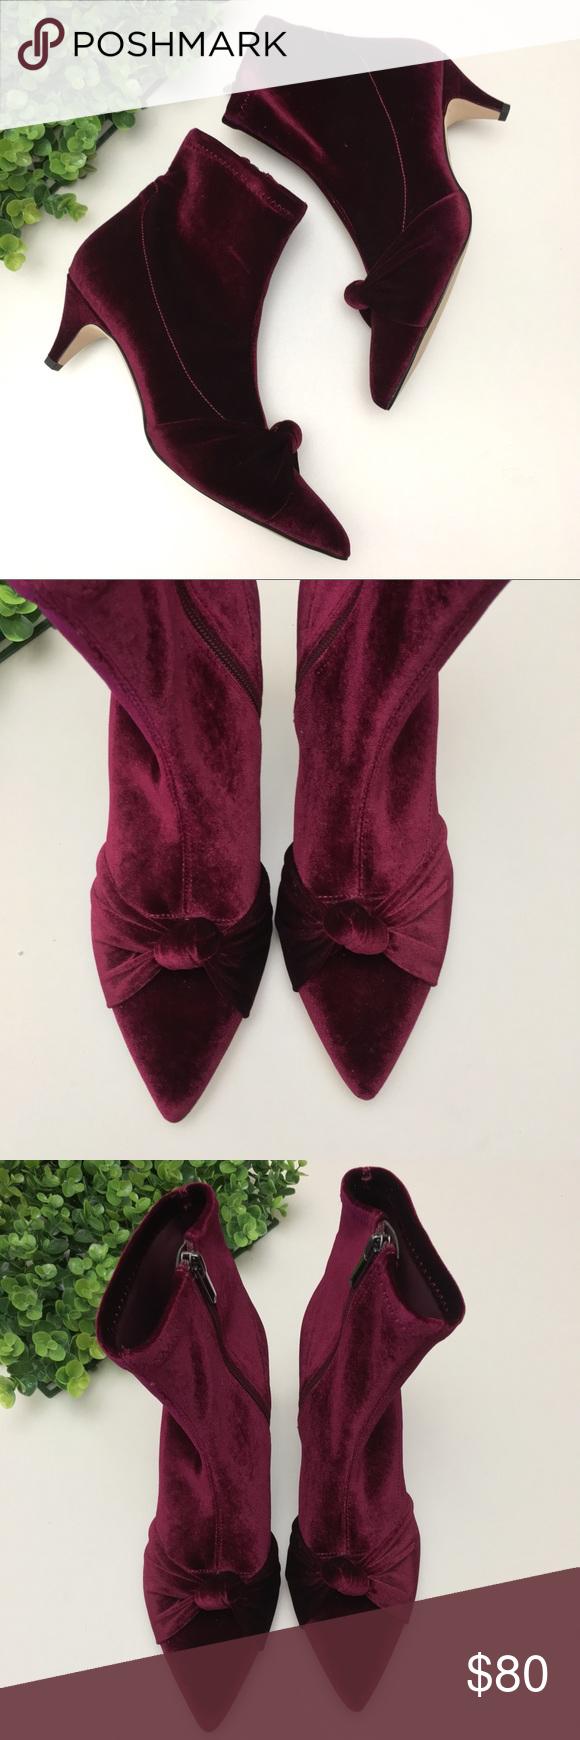 b7d0dff20 Sam Edelman Keena Velvet Knot Ankle Boots Wine Sam Edelman Womens Keena Knot  Velvet Ankle Booties